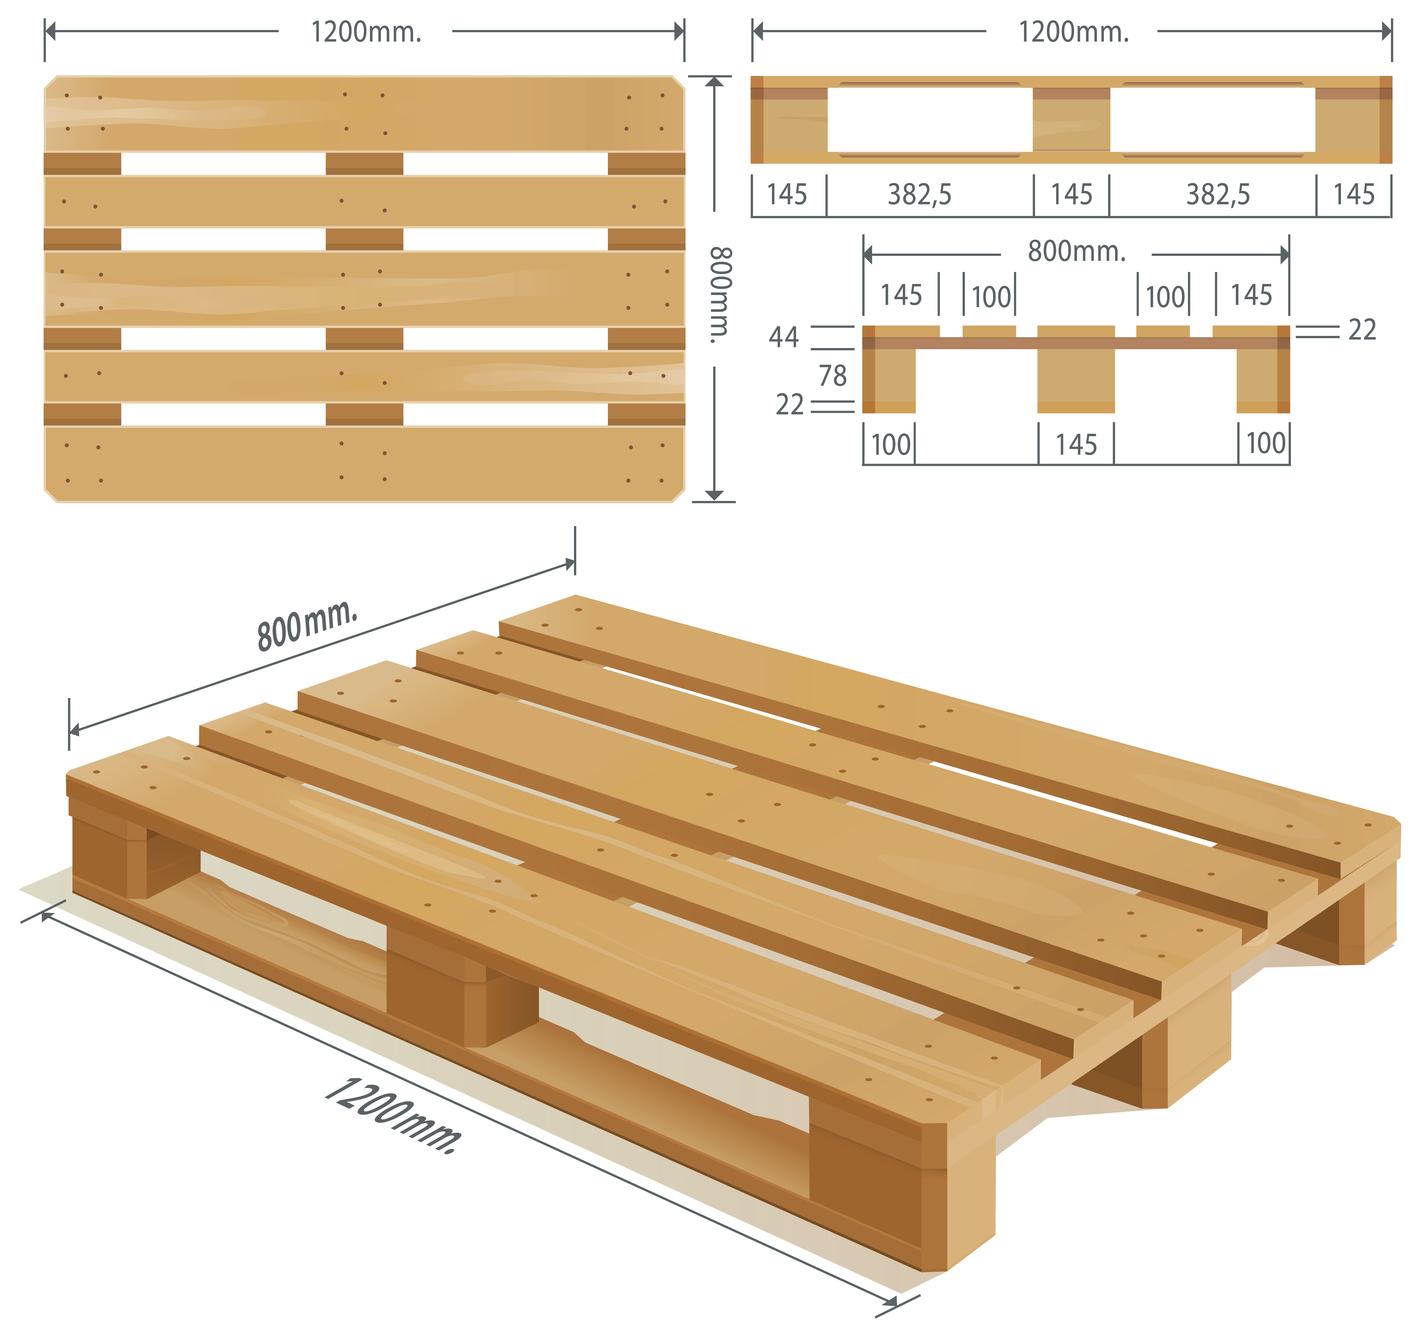 Standard Pallet Size Singapore Google Search Pallet Size Pallet Diy Wooden Pallets